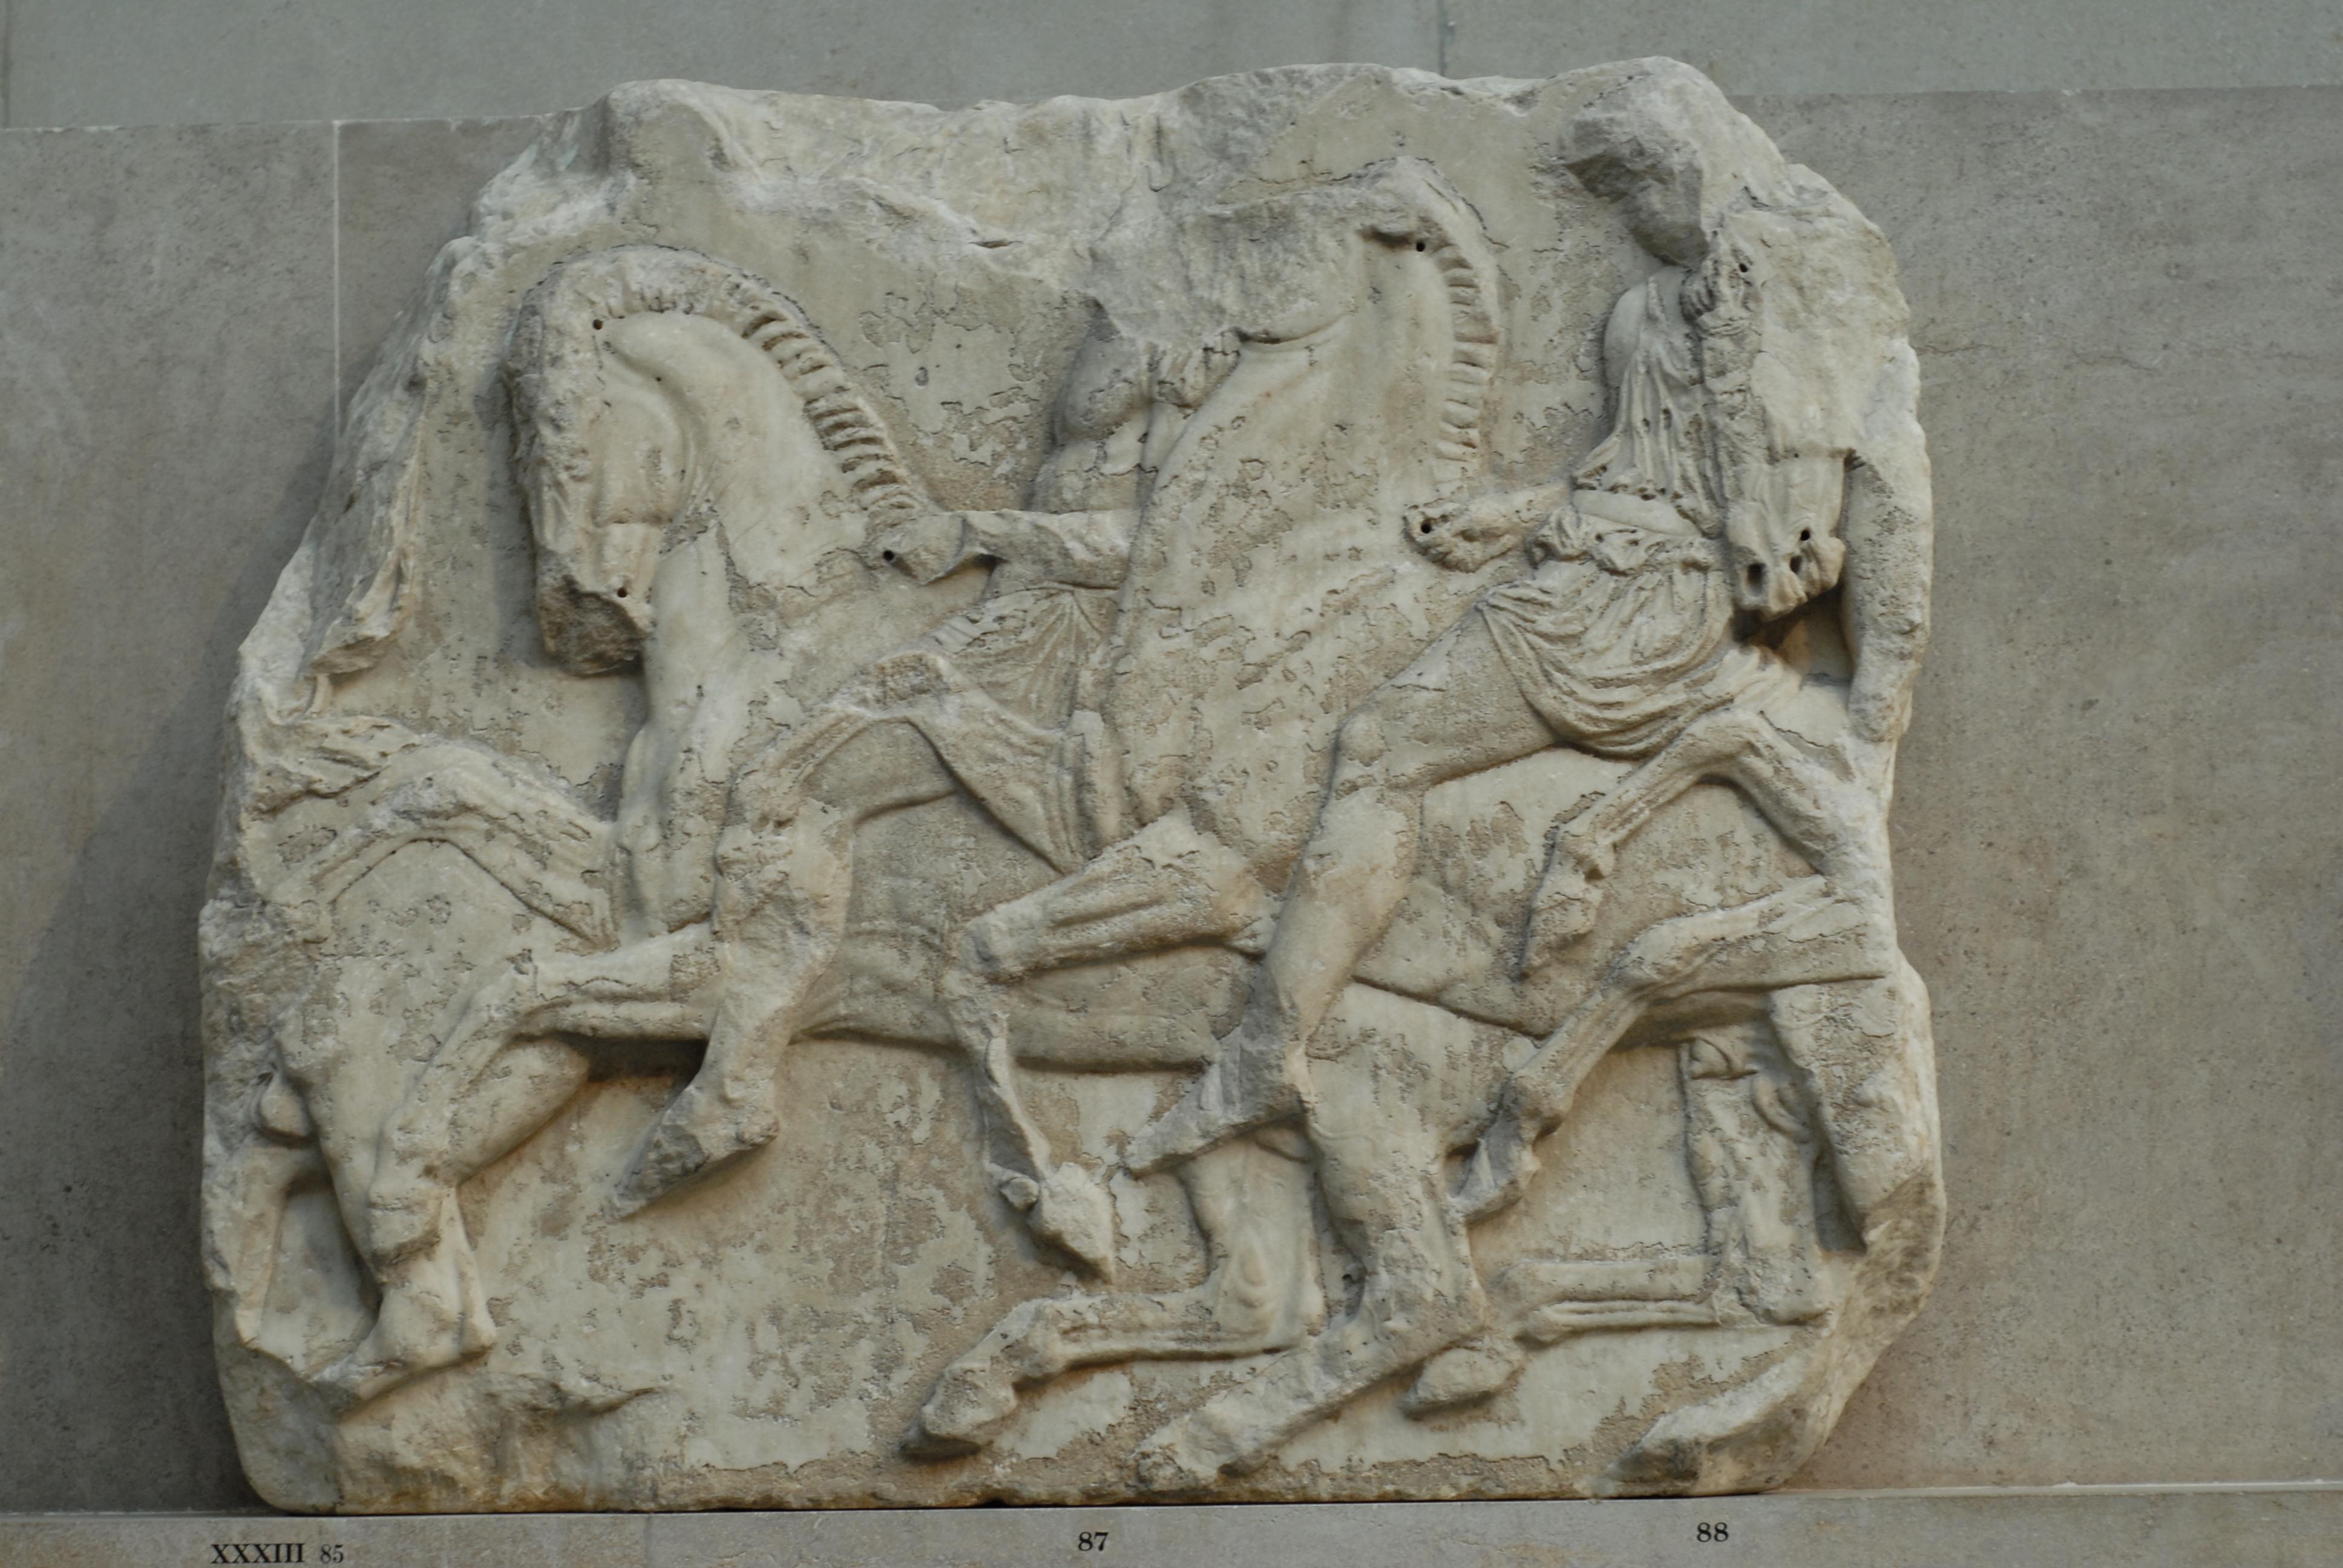 Xxxiii File:Parthenon frieze ...